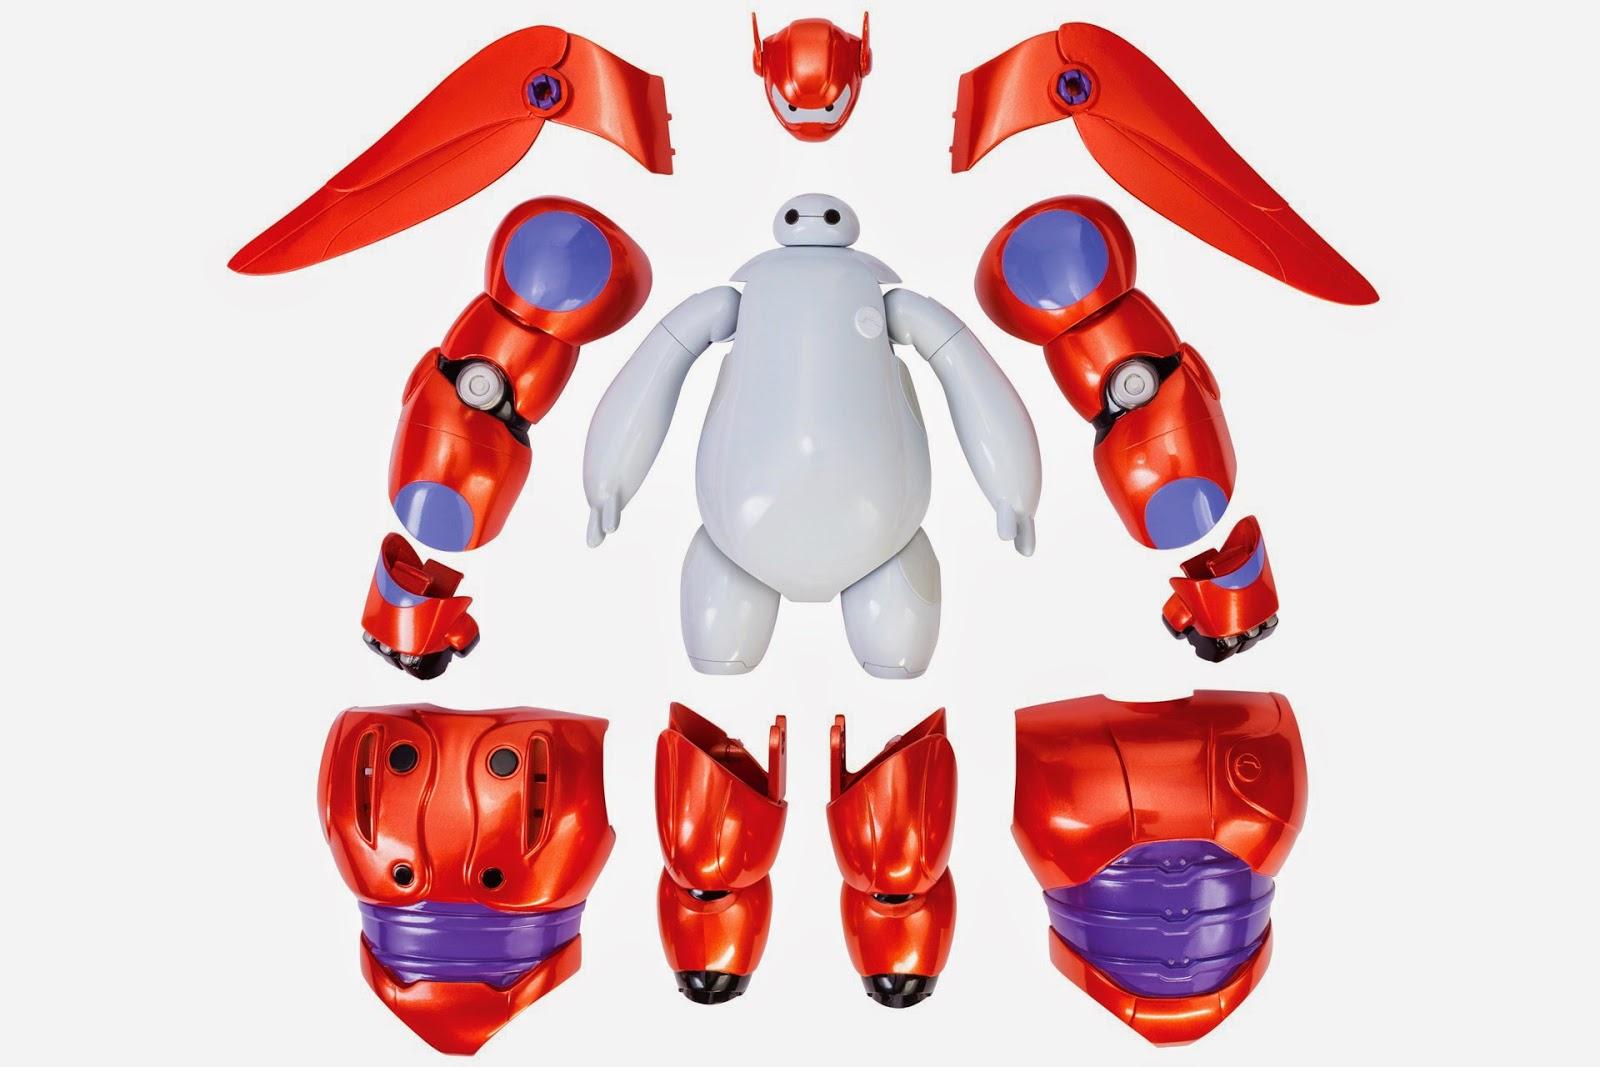 Gambar Baymax Big Hero 6 Marvel Walt Disney Animasi Lucu Keren